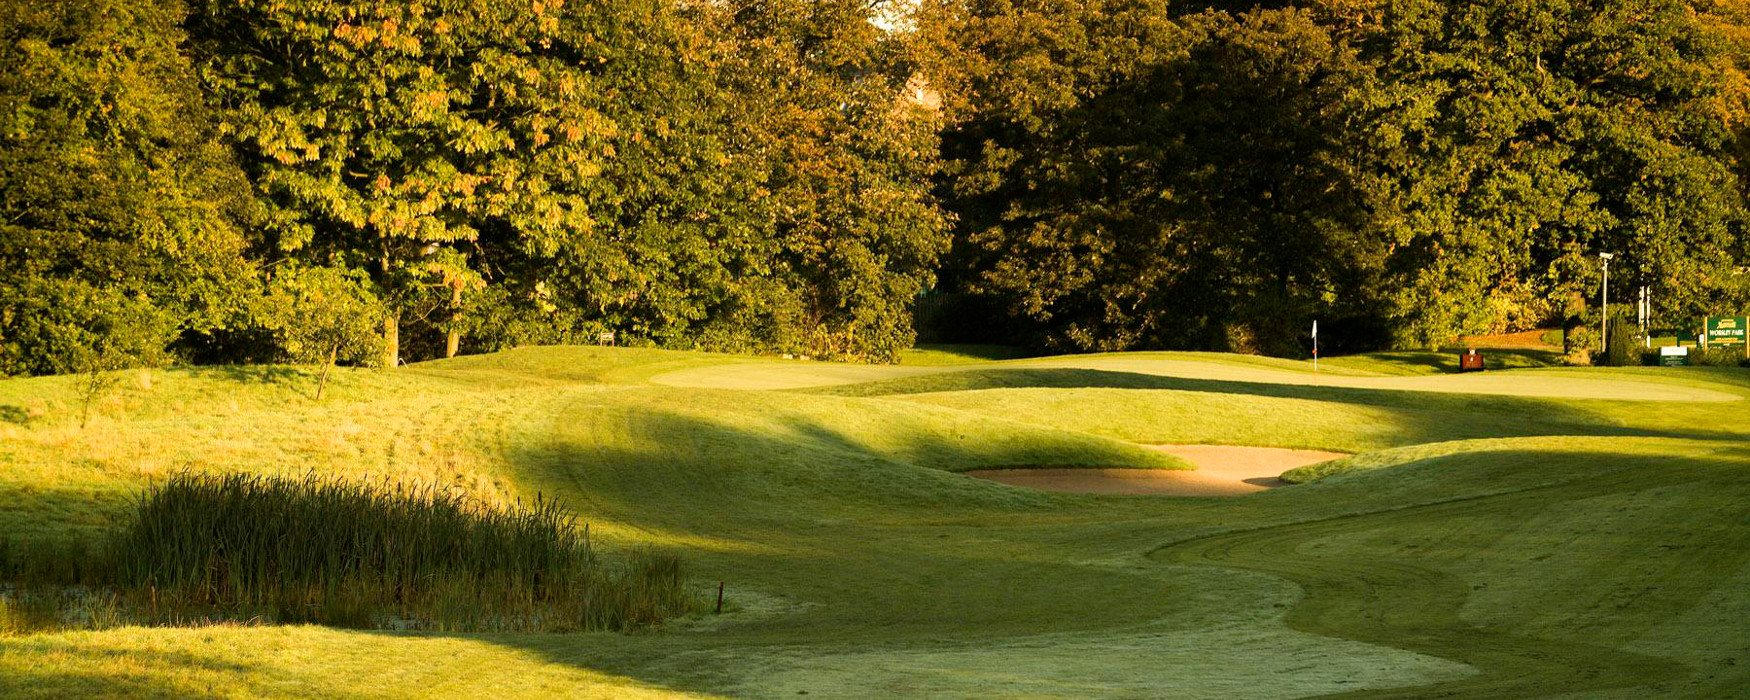 Golf in Manchester